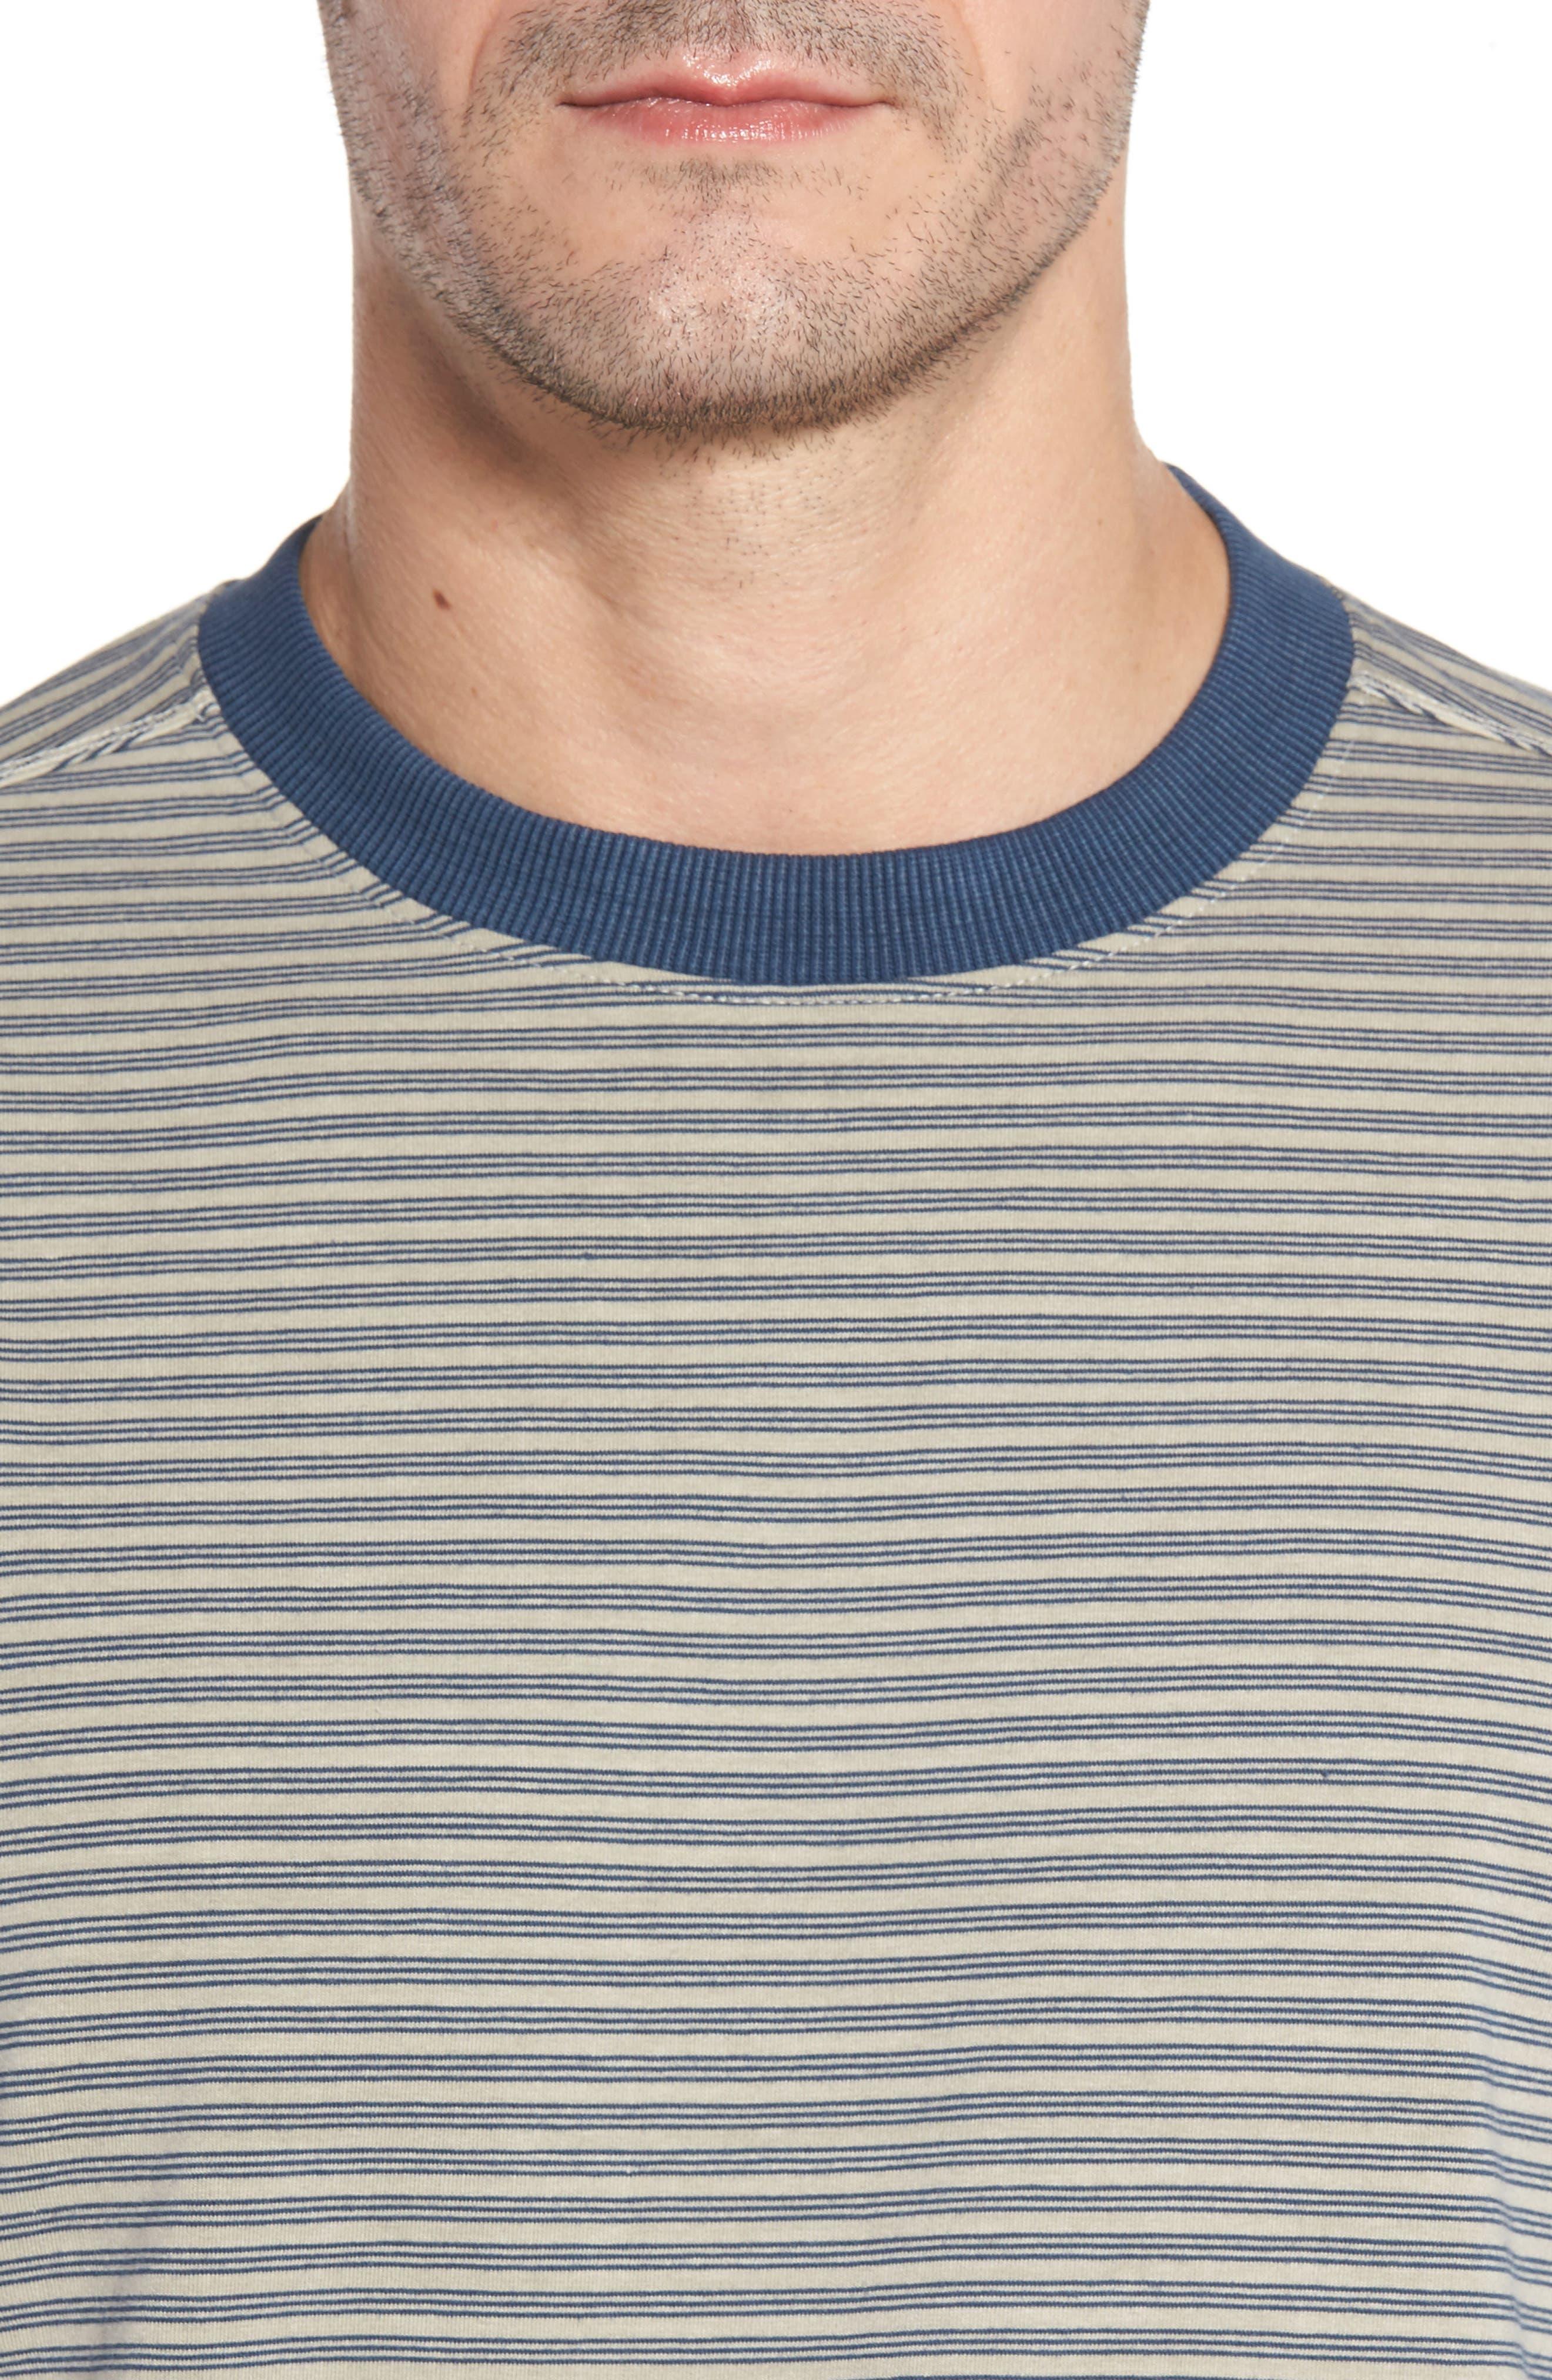 Iverson Long Sleeve Striped T-Shirt,                             Alternate thumbnail 4, color,                             290